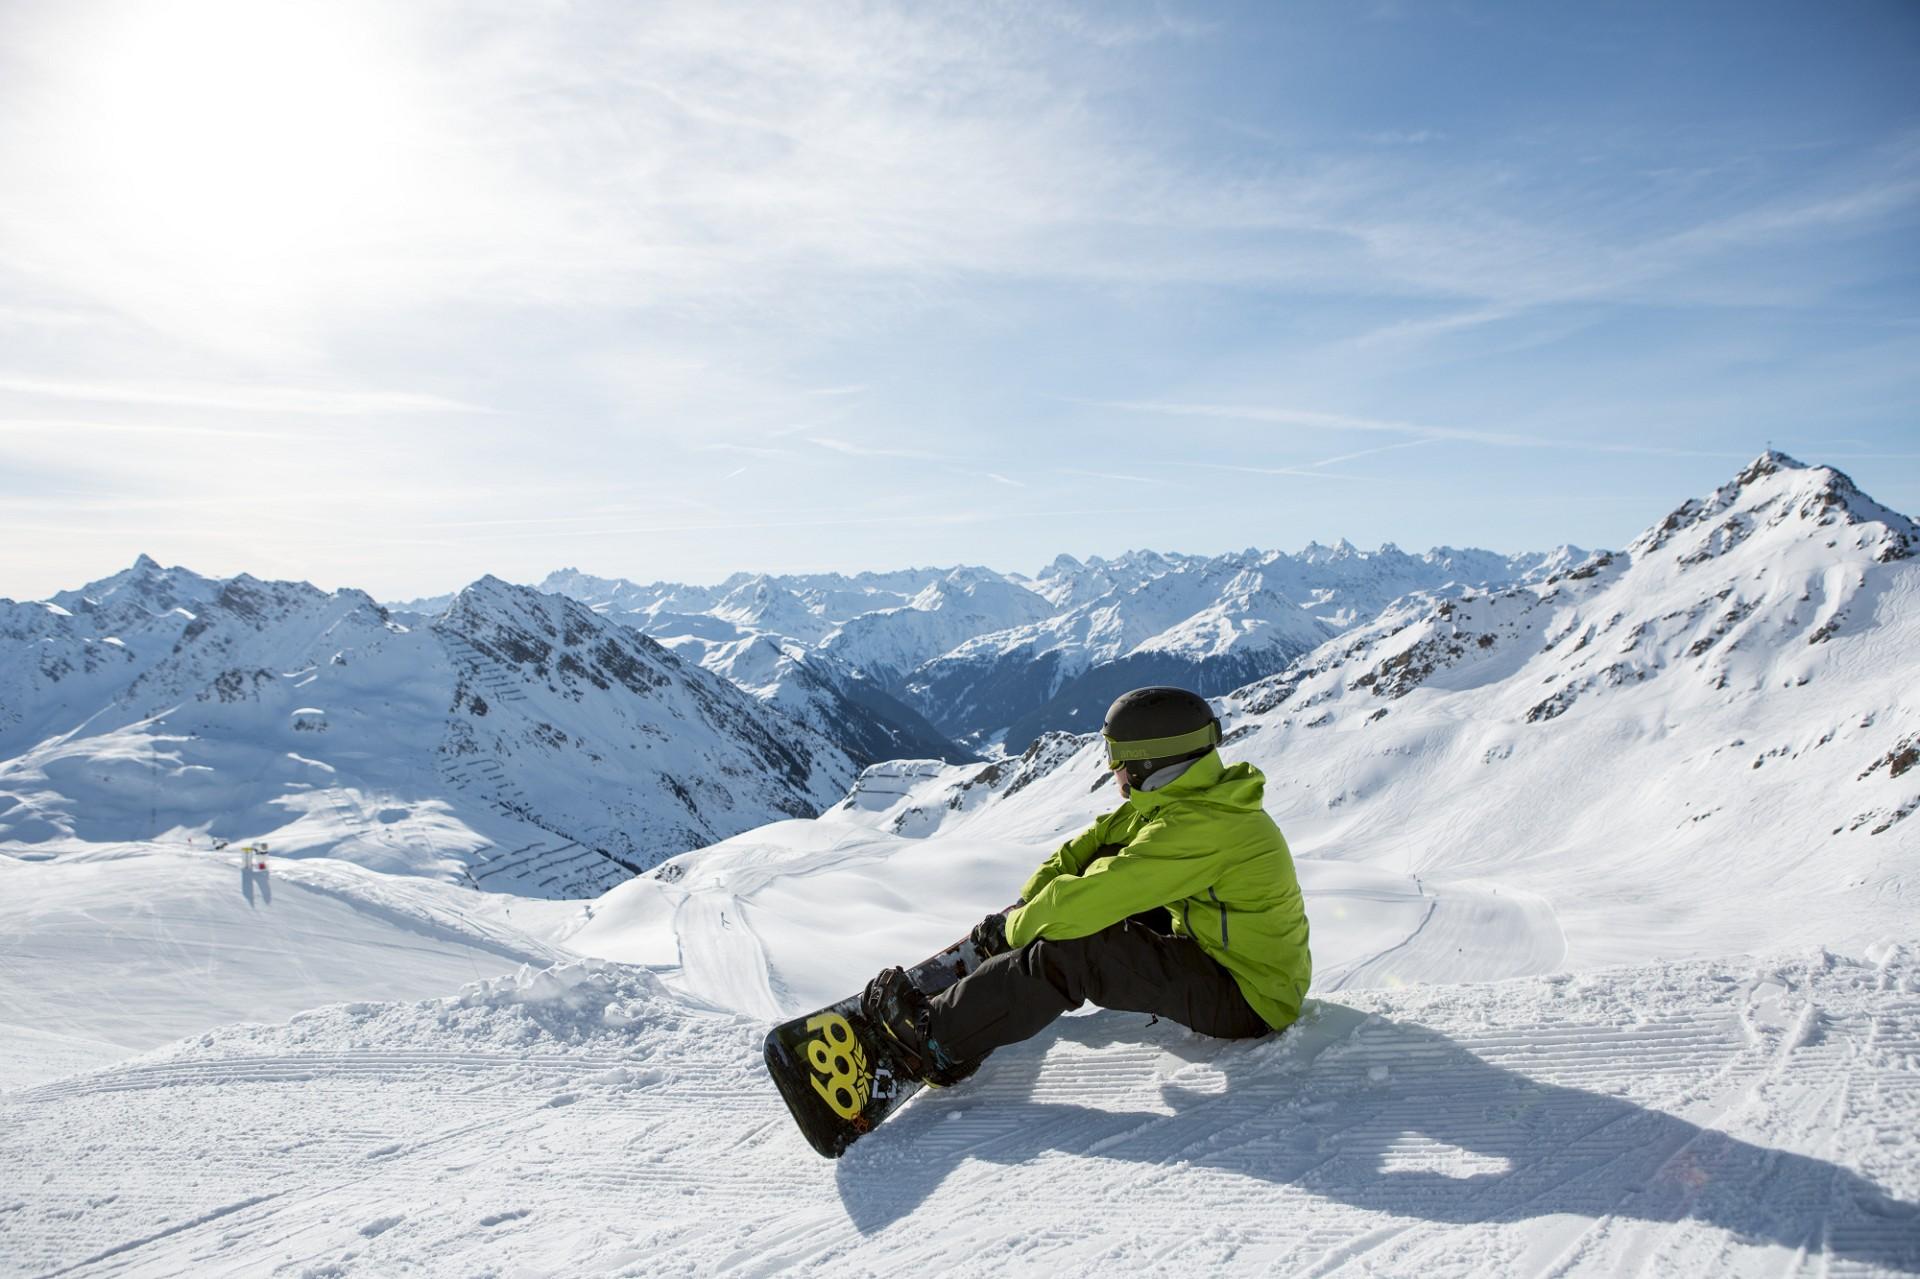 Snowboarden im Montafon (c) Daniel Zangerl - Montafon Tourismus GmbH, Schruns